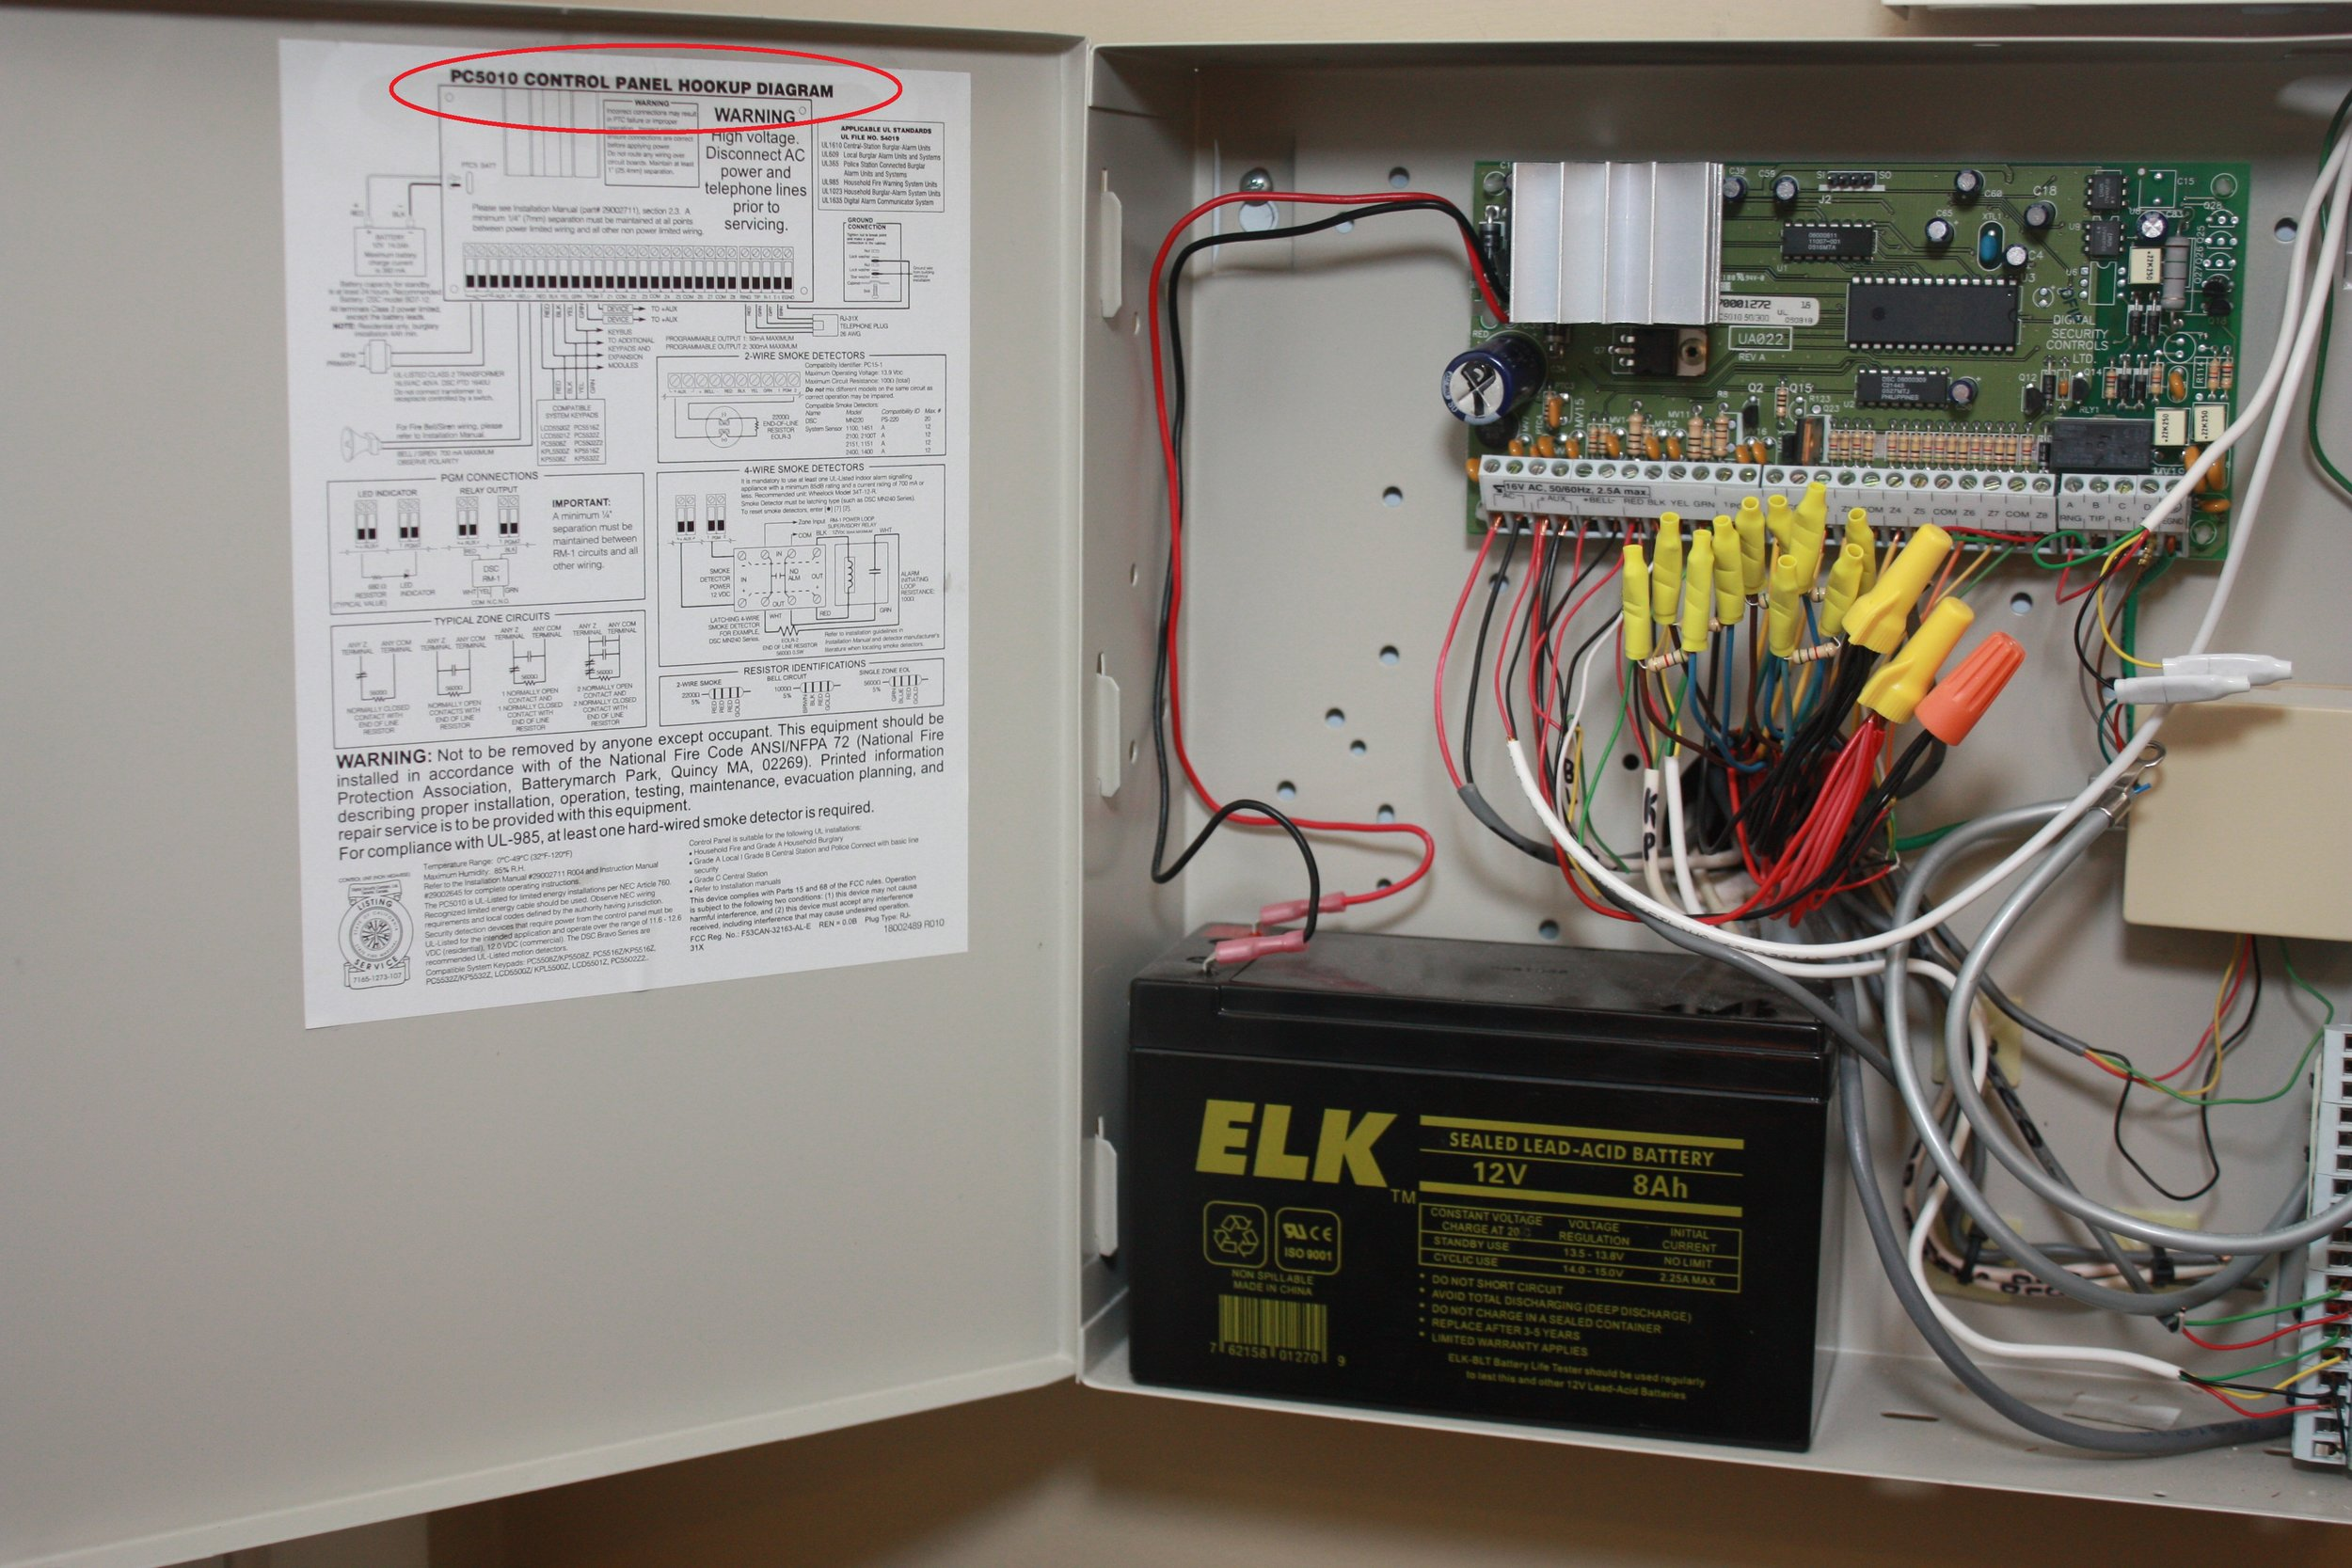 wiring diagram for house db 2004 bmw x5 headlight 5500 dsc power series custom alpha — nca alarms nashville